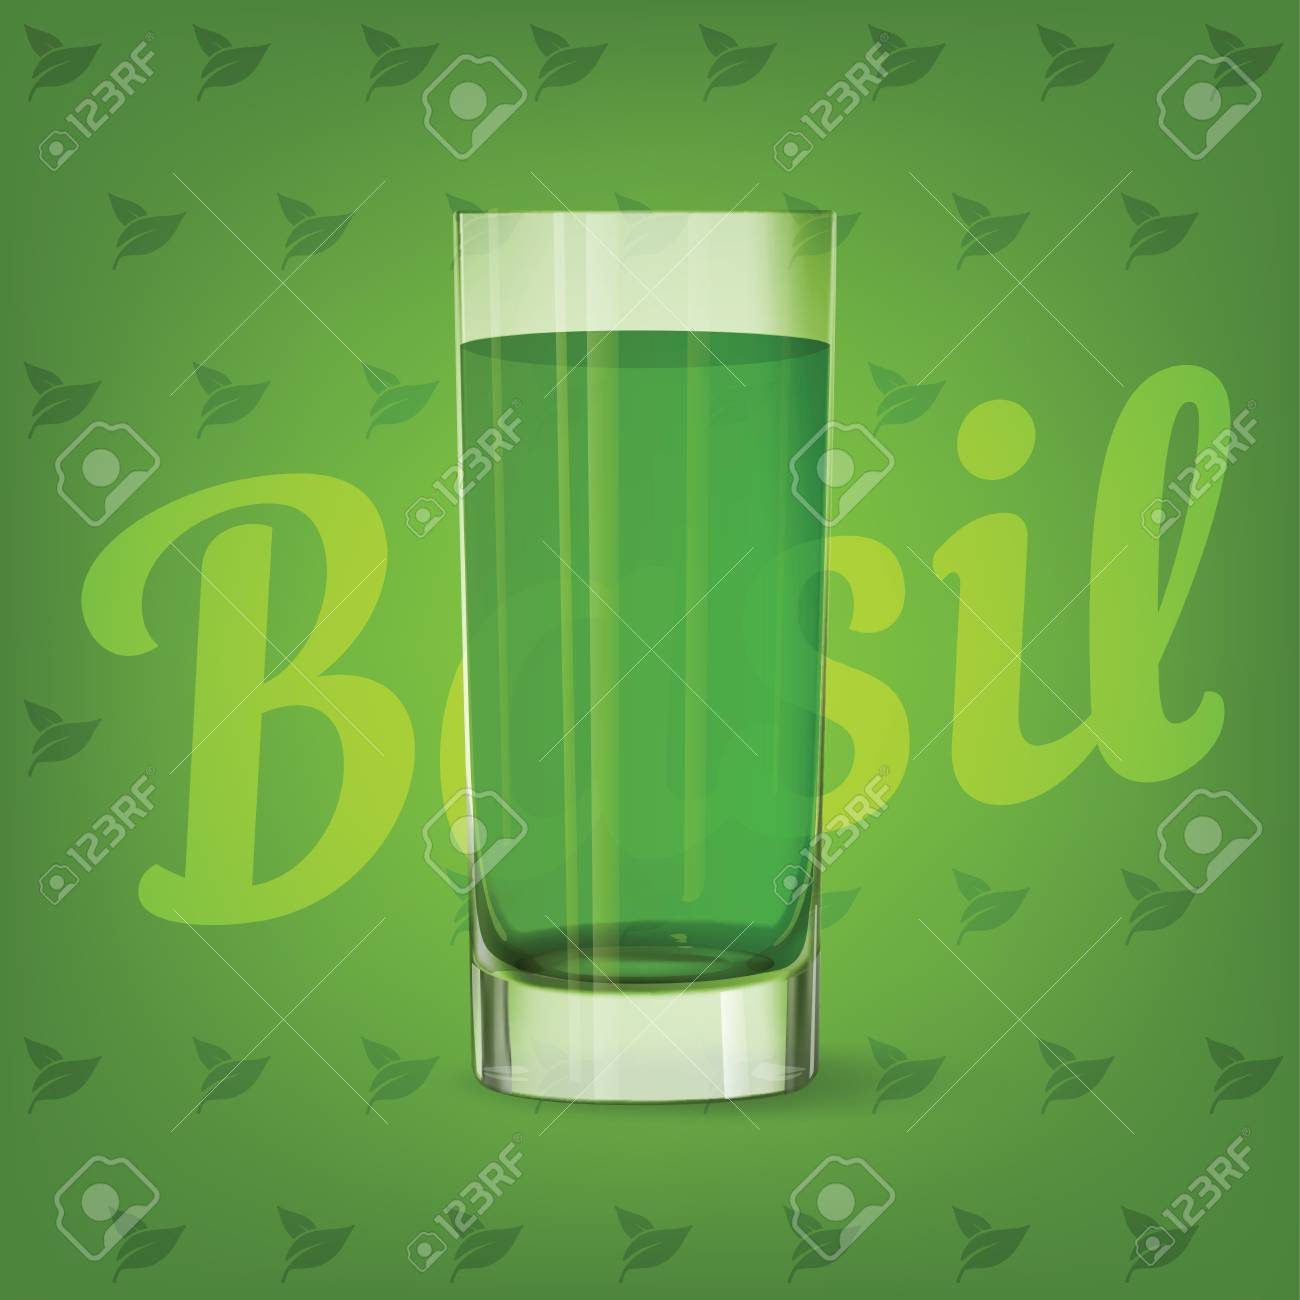 Vector image of fresh fruit green glass of basil juice - 84037574